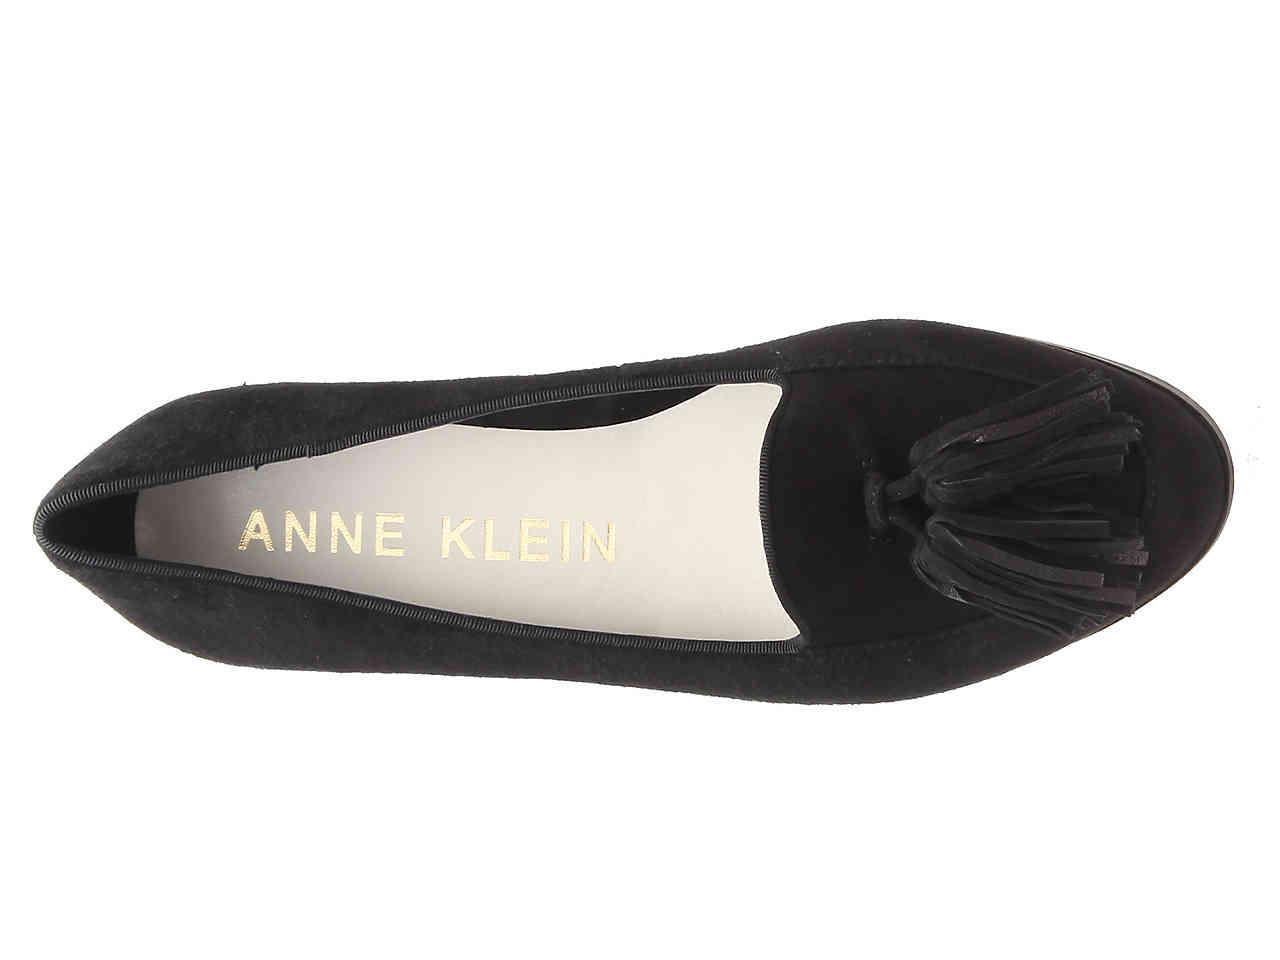 fb2ee5e7f57 Lyst - Anne Klein Darcey Loafer in Black